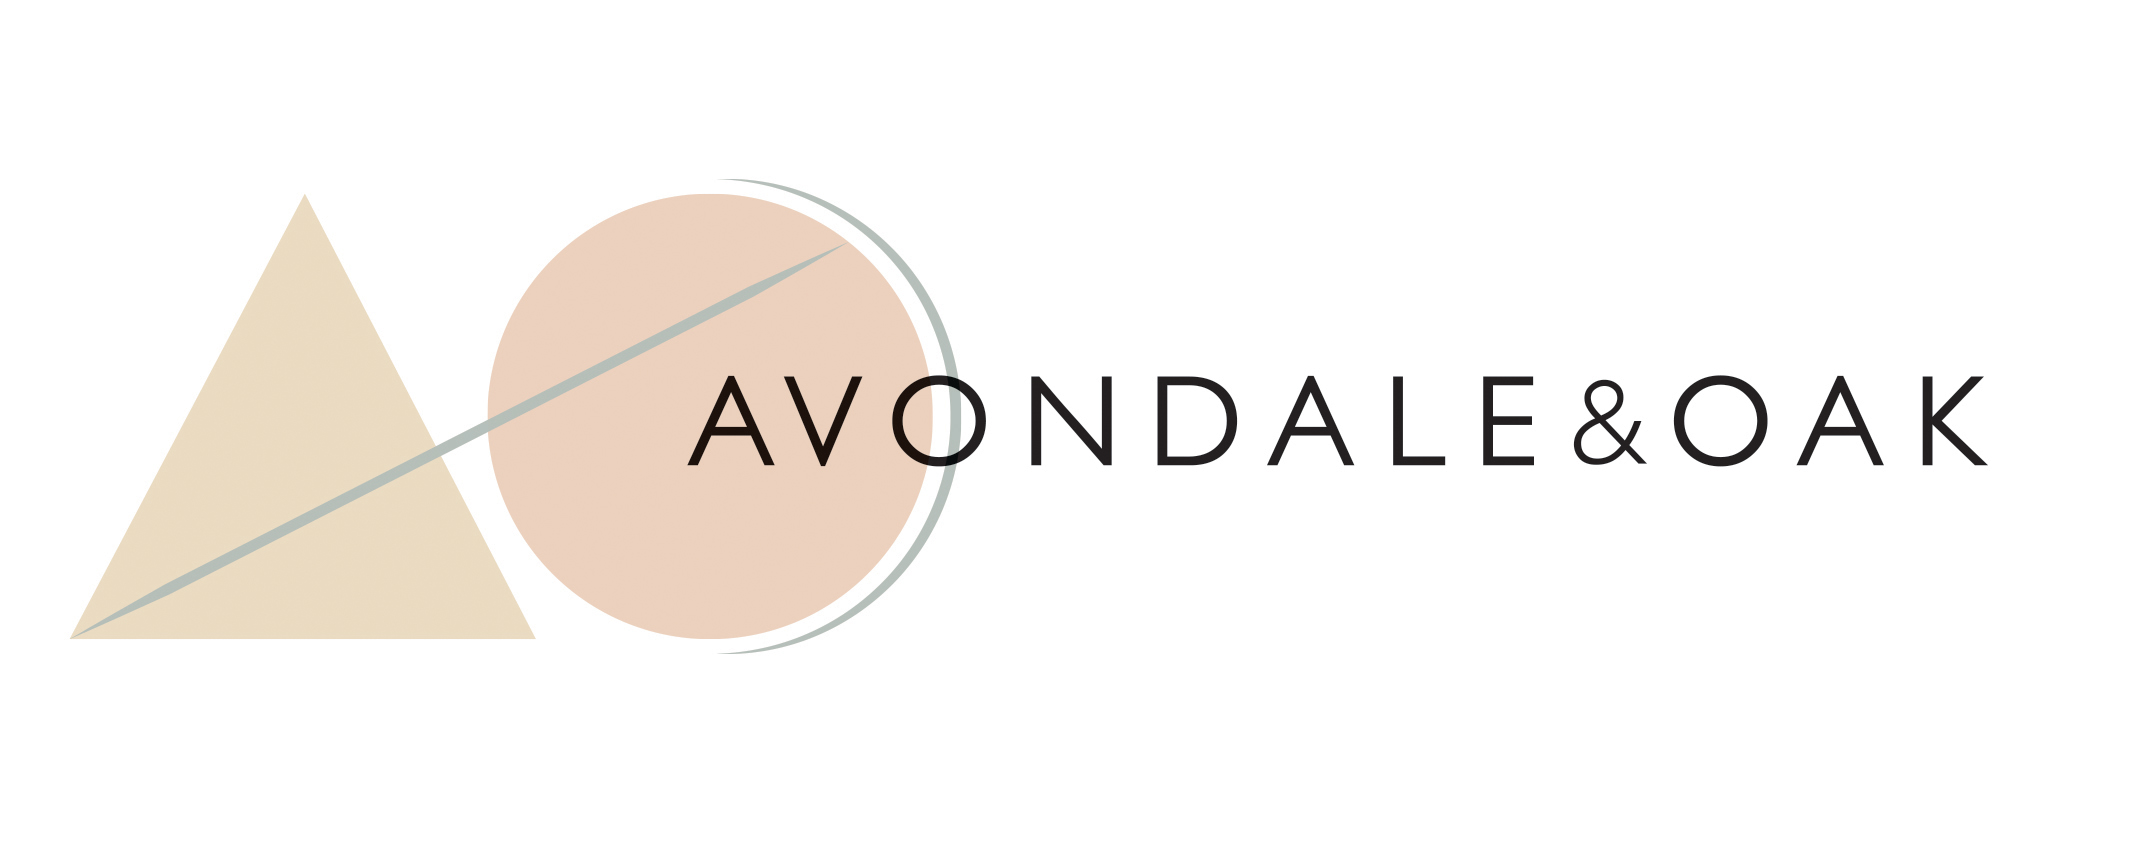 Avondale & Oak